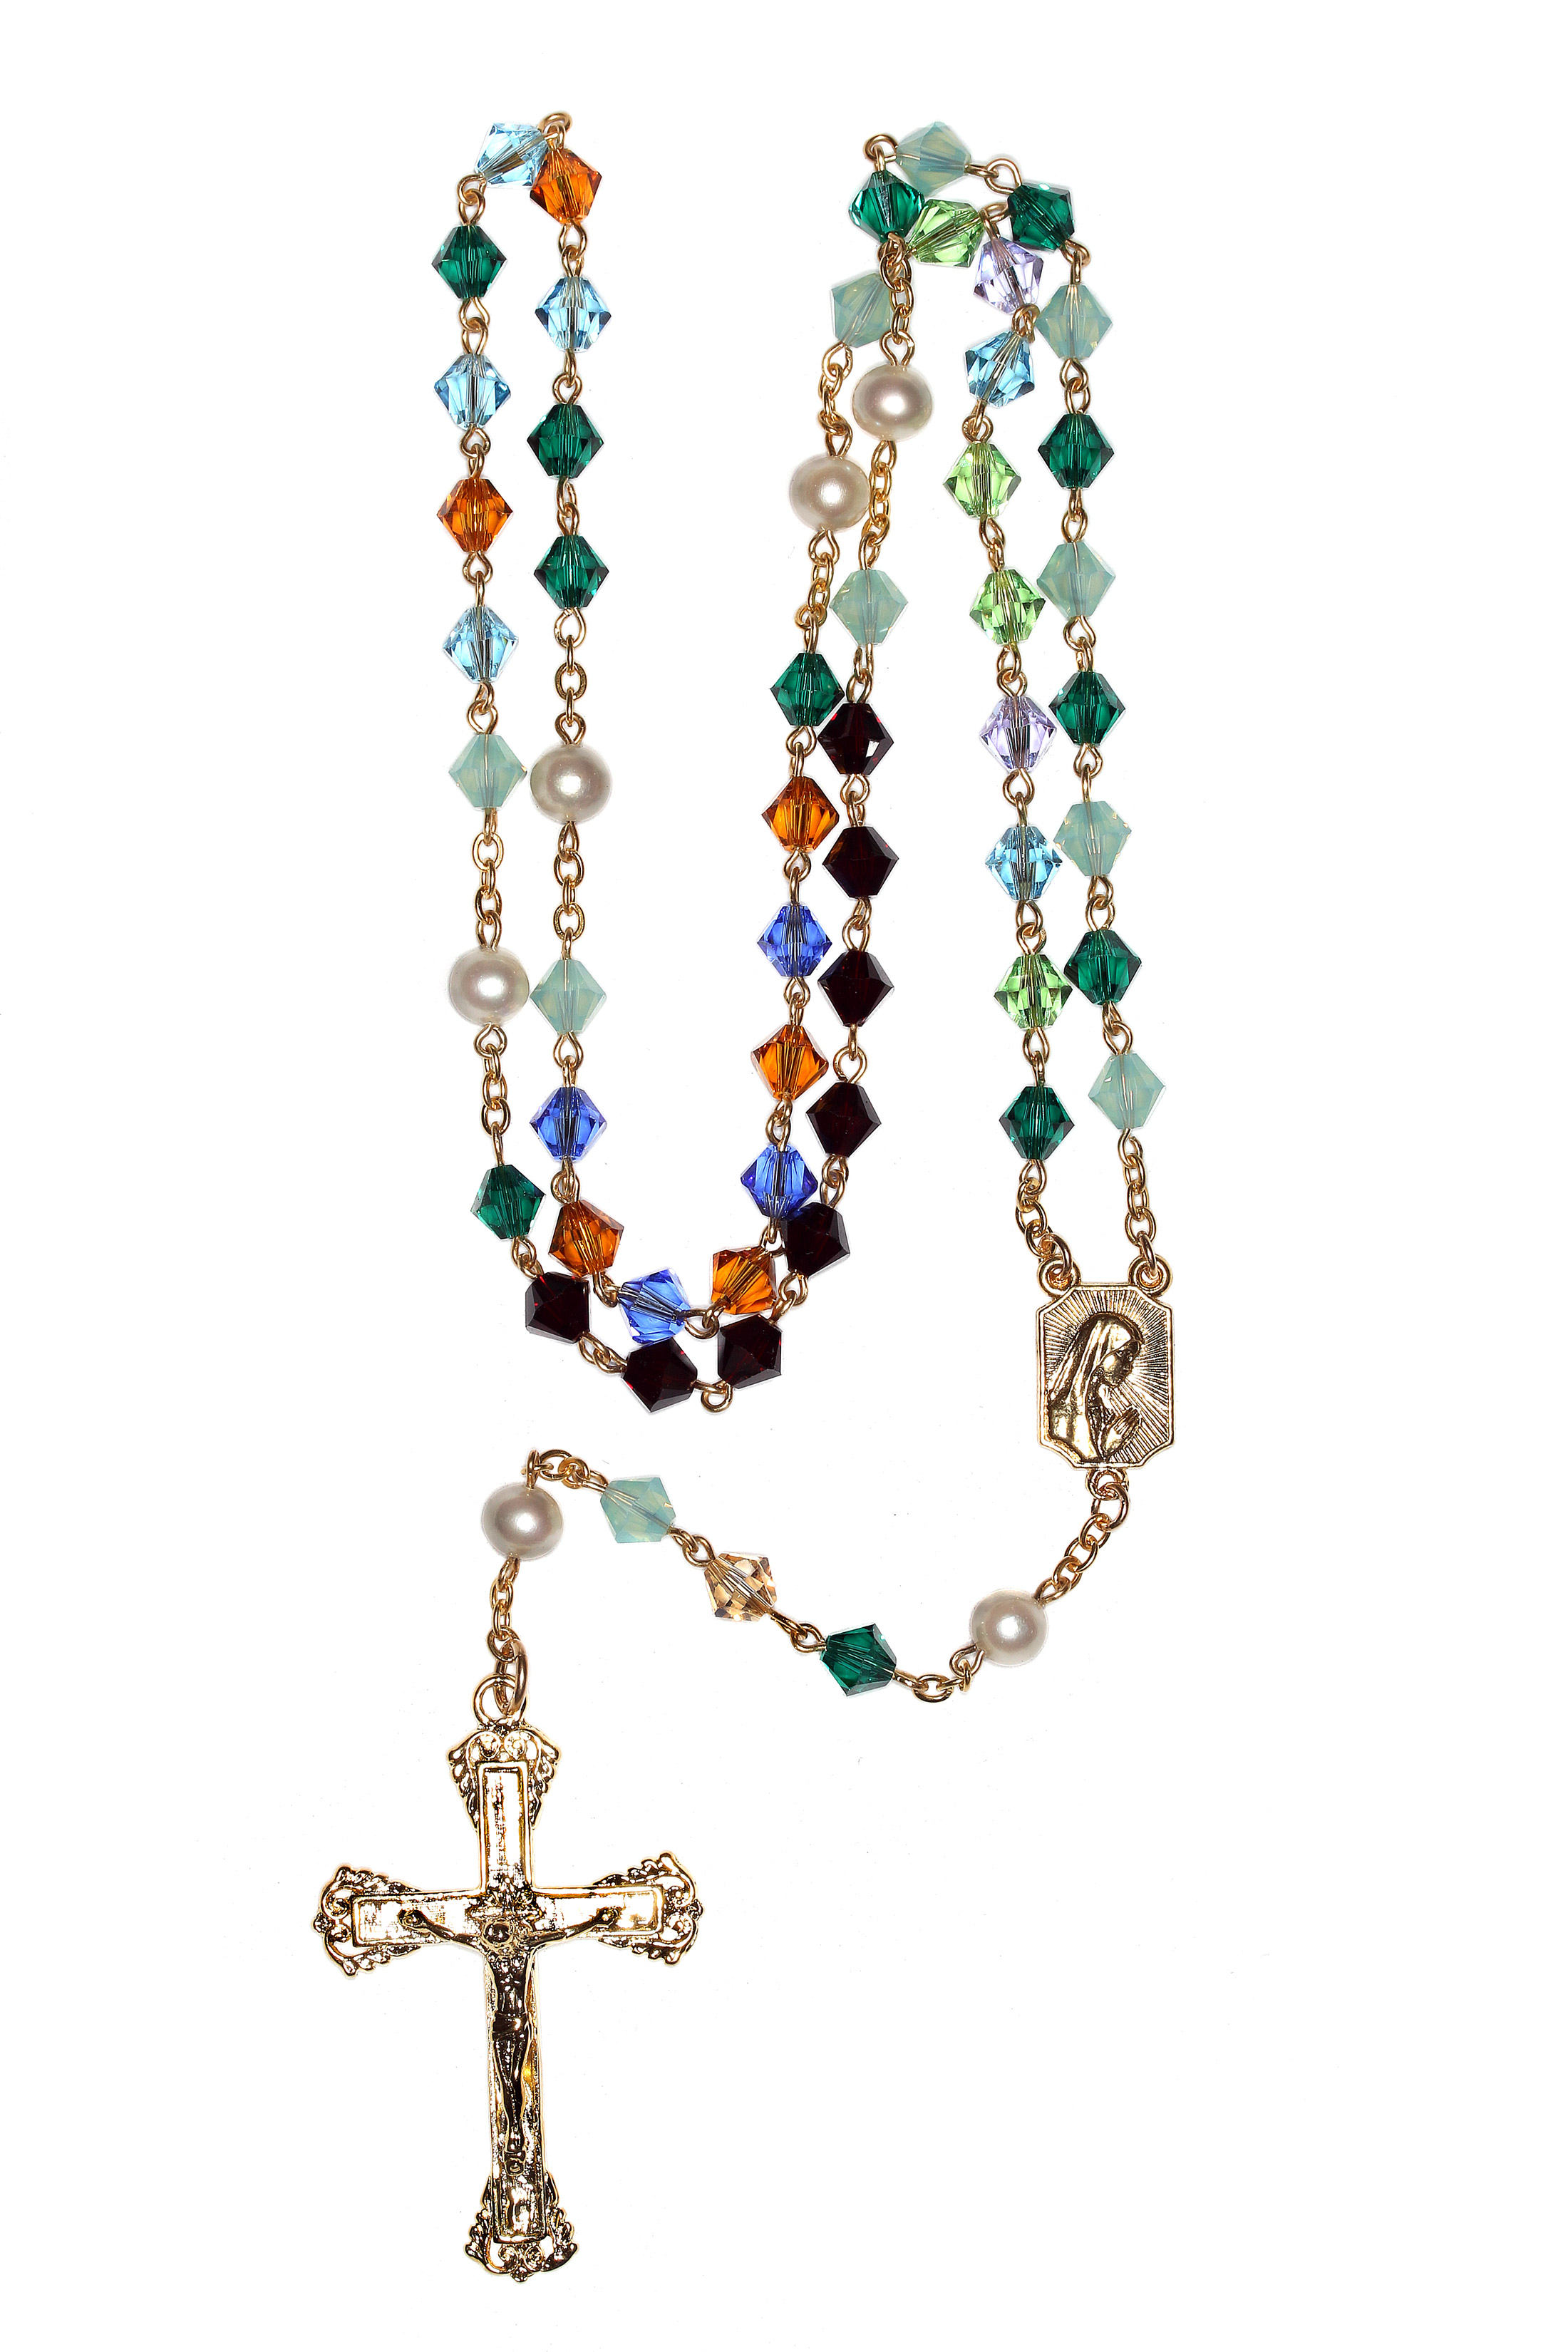 e35baa1e8 Custom Birthstone Crystal Rosary - Gold Plate Sterling | Shop Rosaries